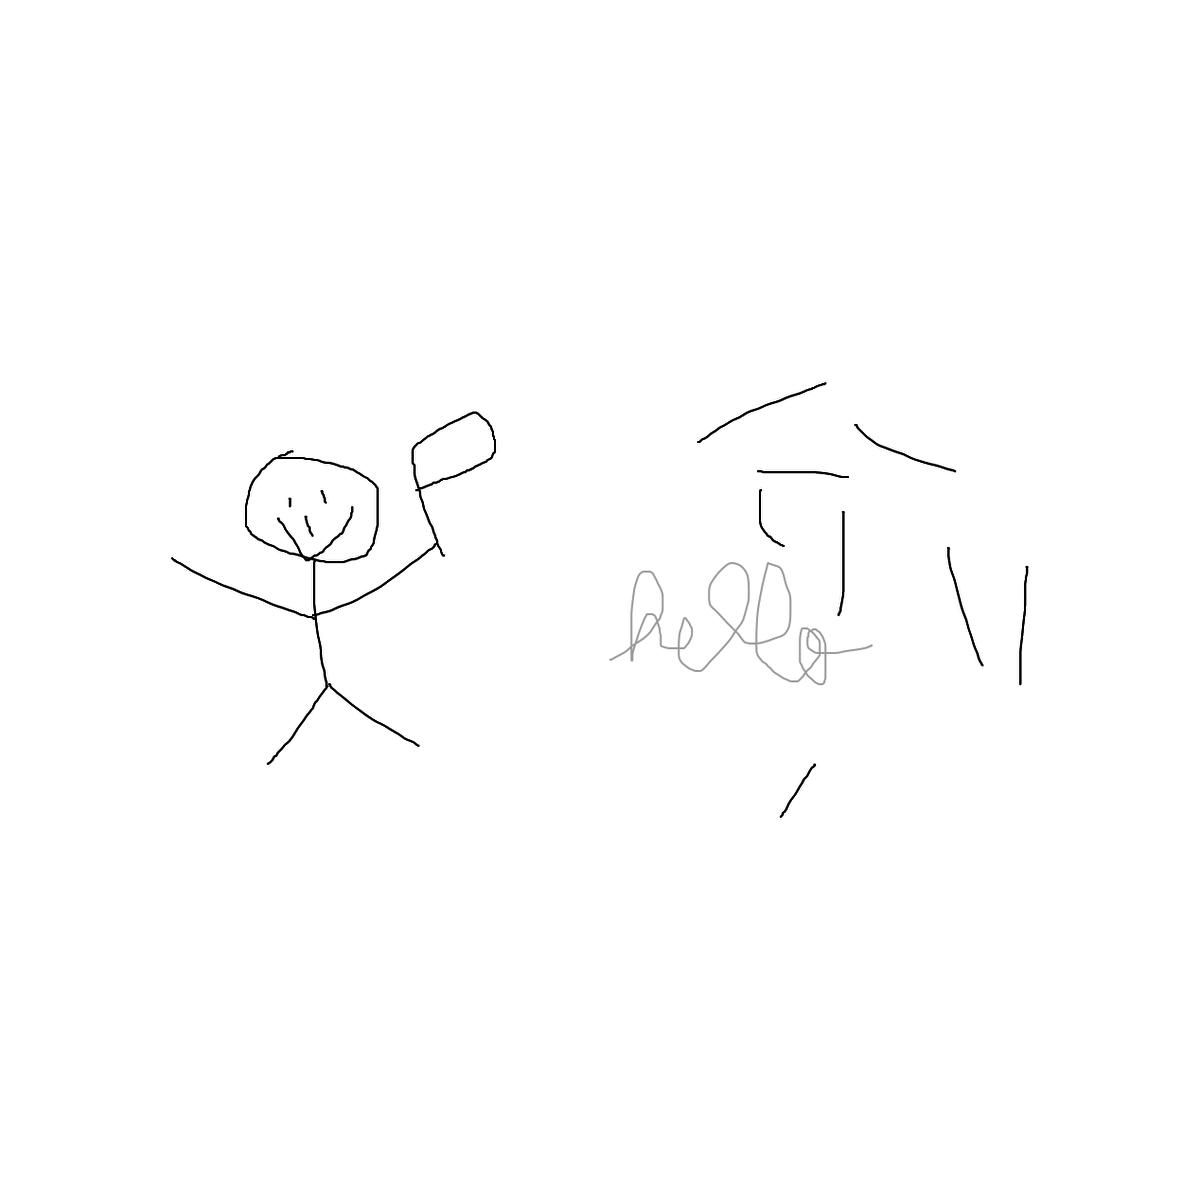 BAAAM drawing#415 lat:49.8893127441406250lng: -97.1850433349609400